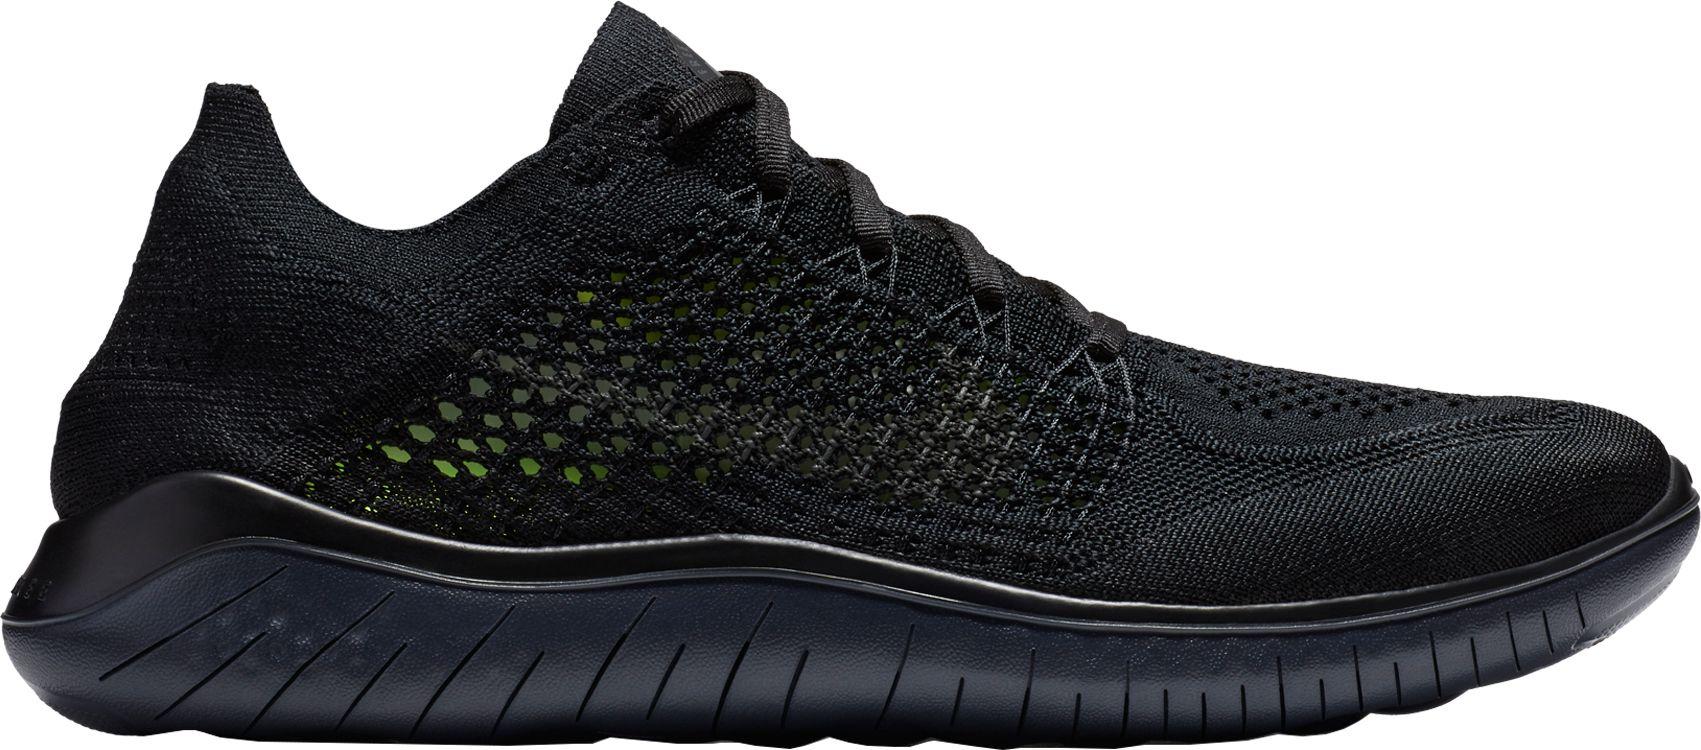 Nike Libre Rn Flyknit 2018 utyoU1